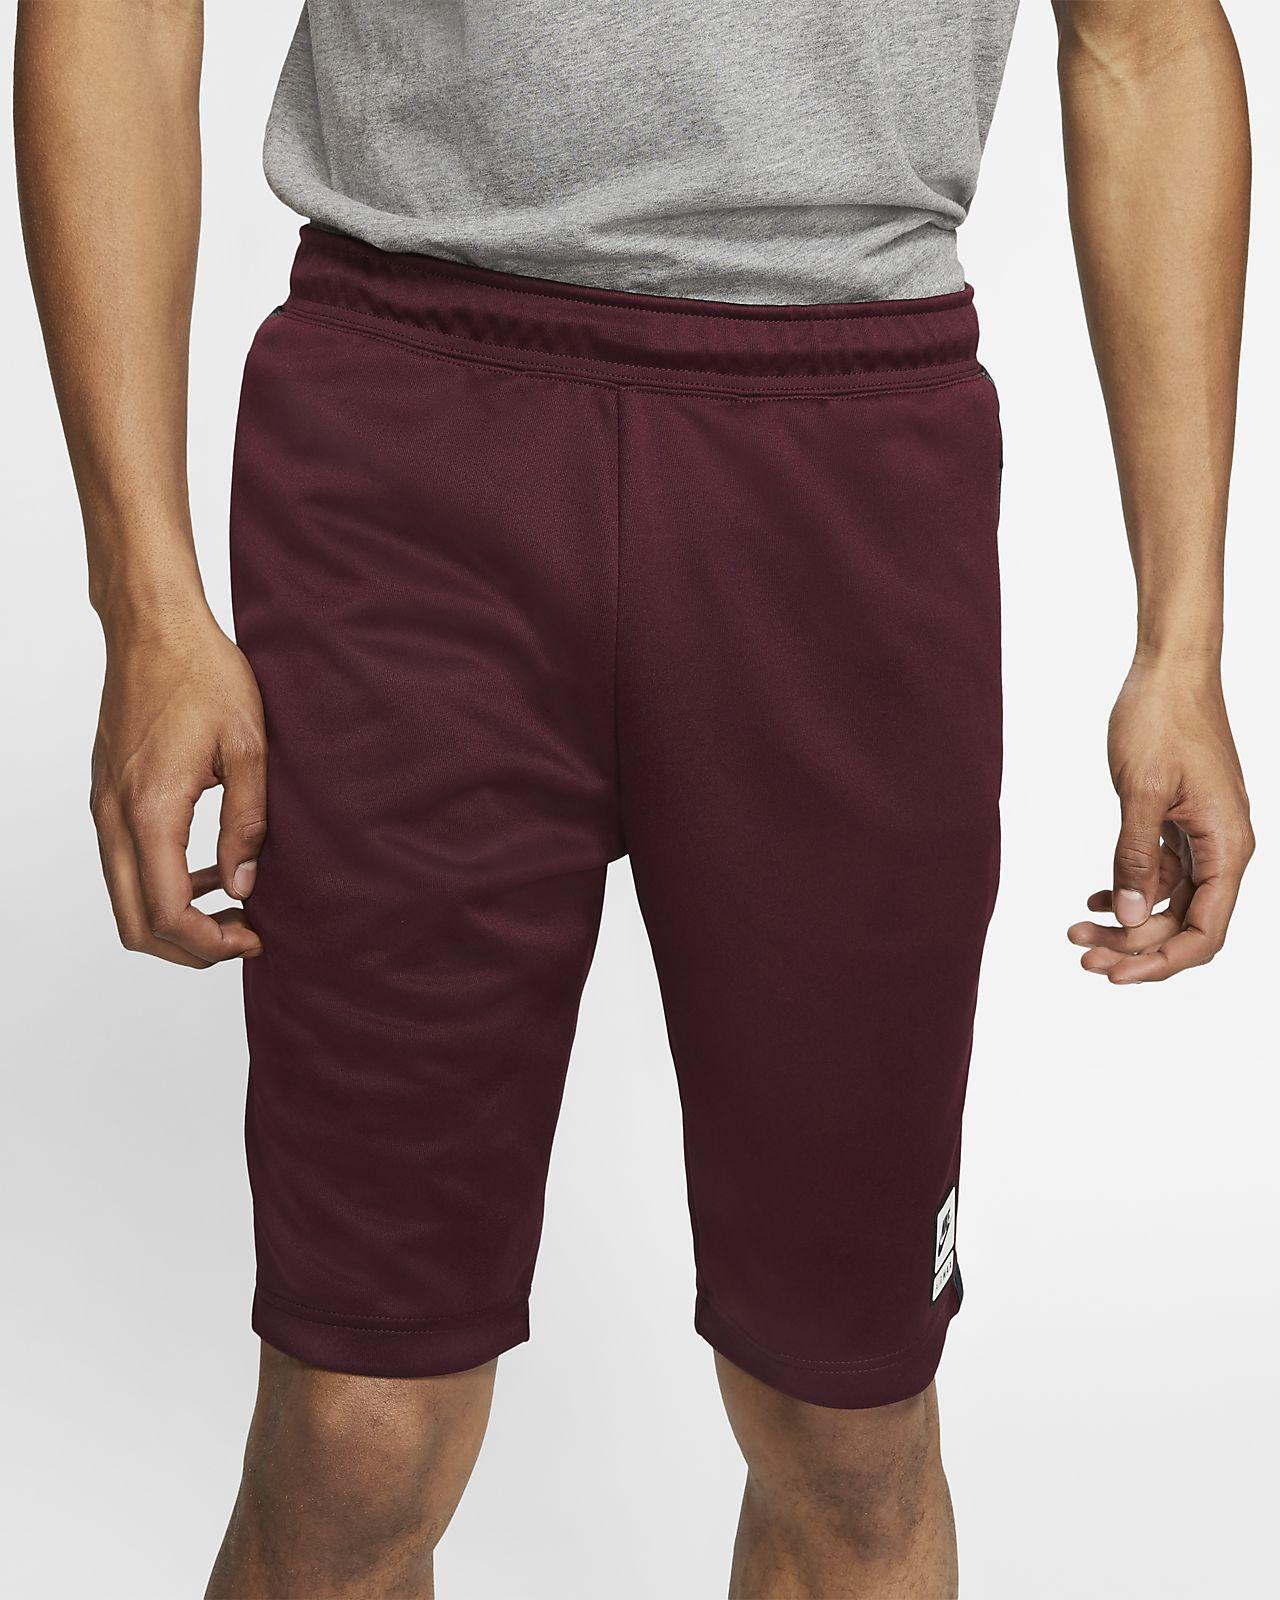 Nike Sportswear Air Max Men's Shorts